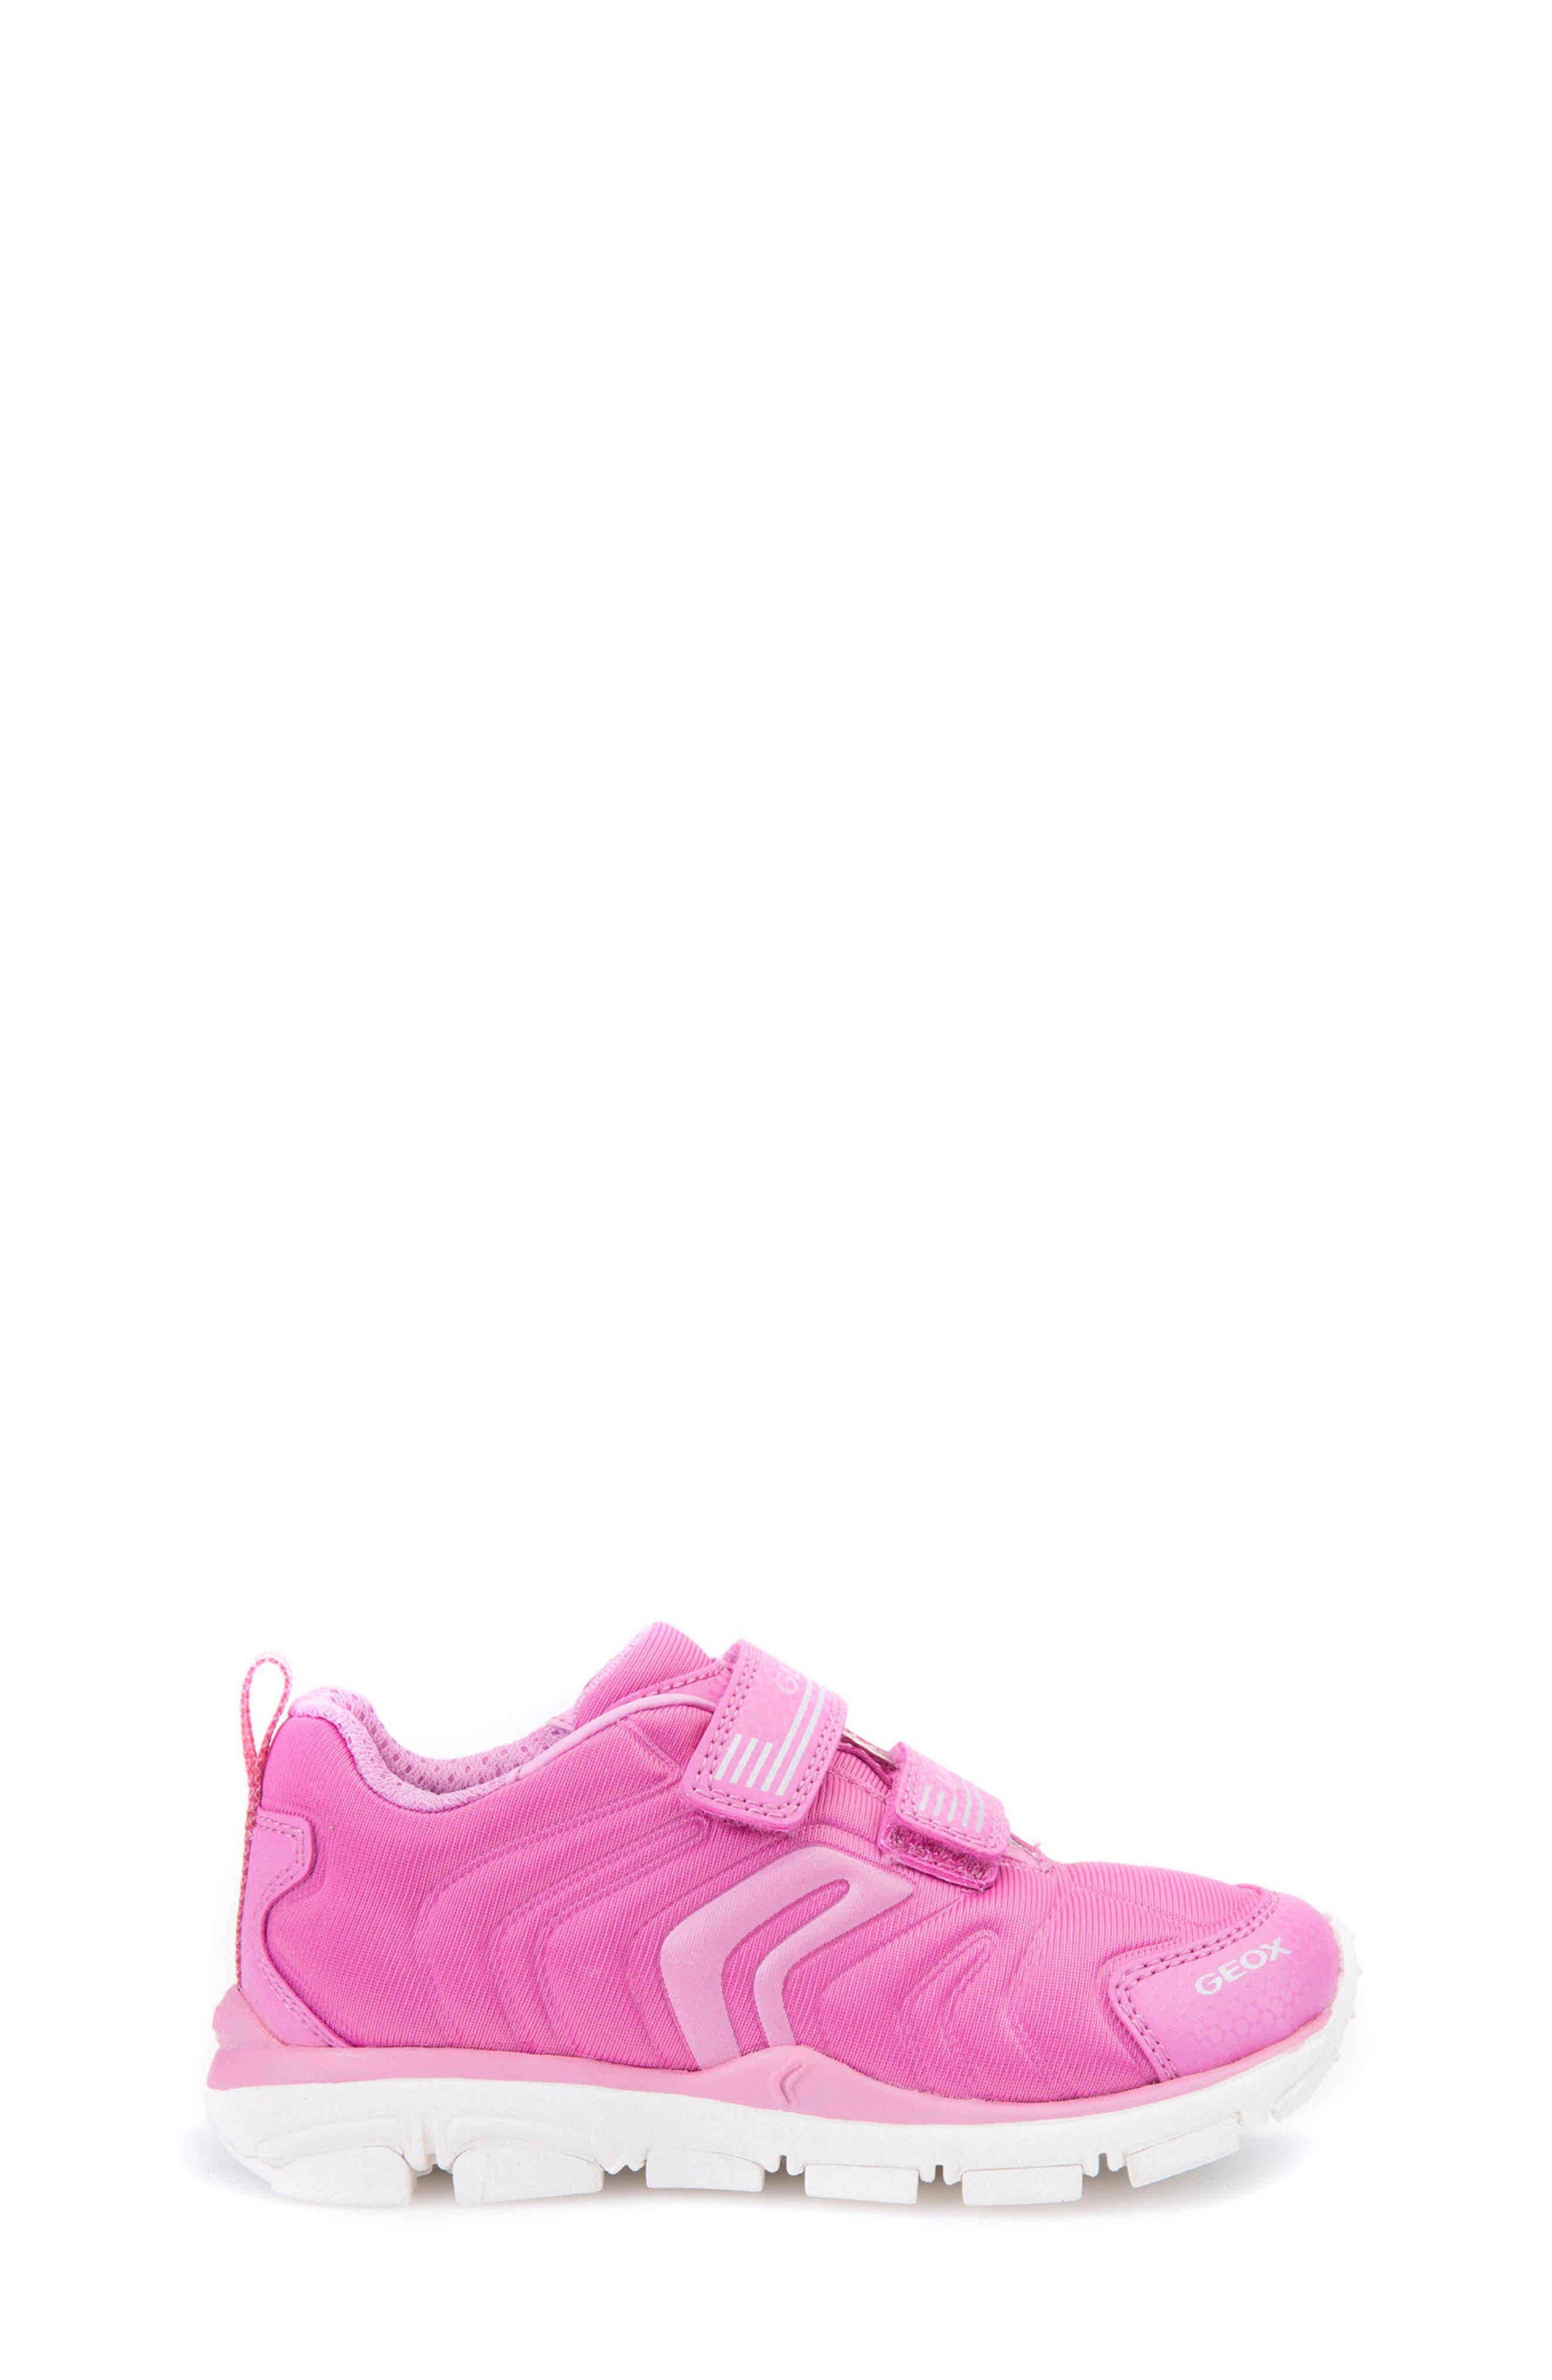 Torque Sneaker,                             Alternate thumbnail 3, color,                             660